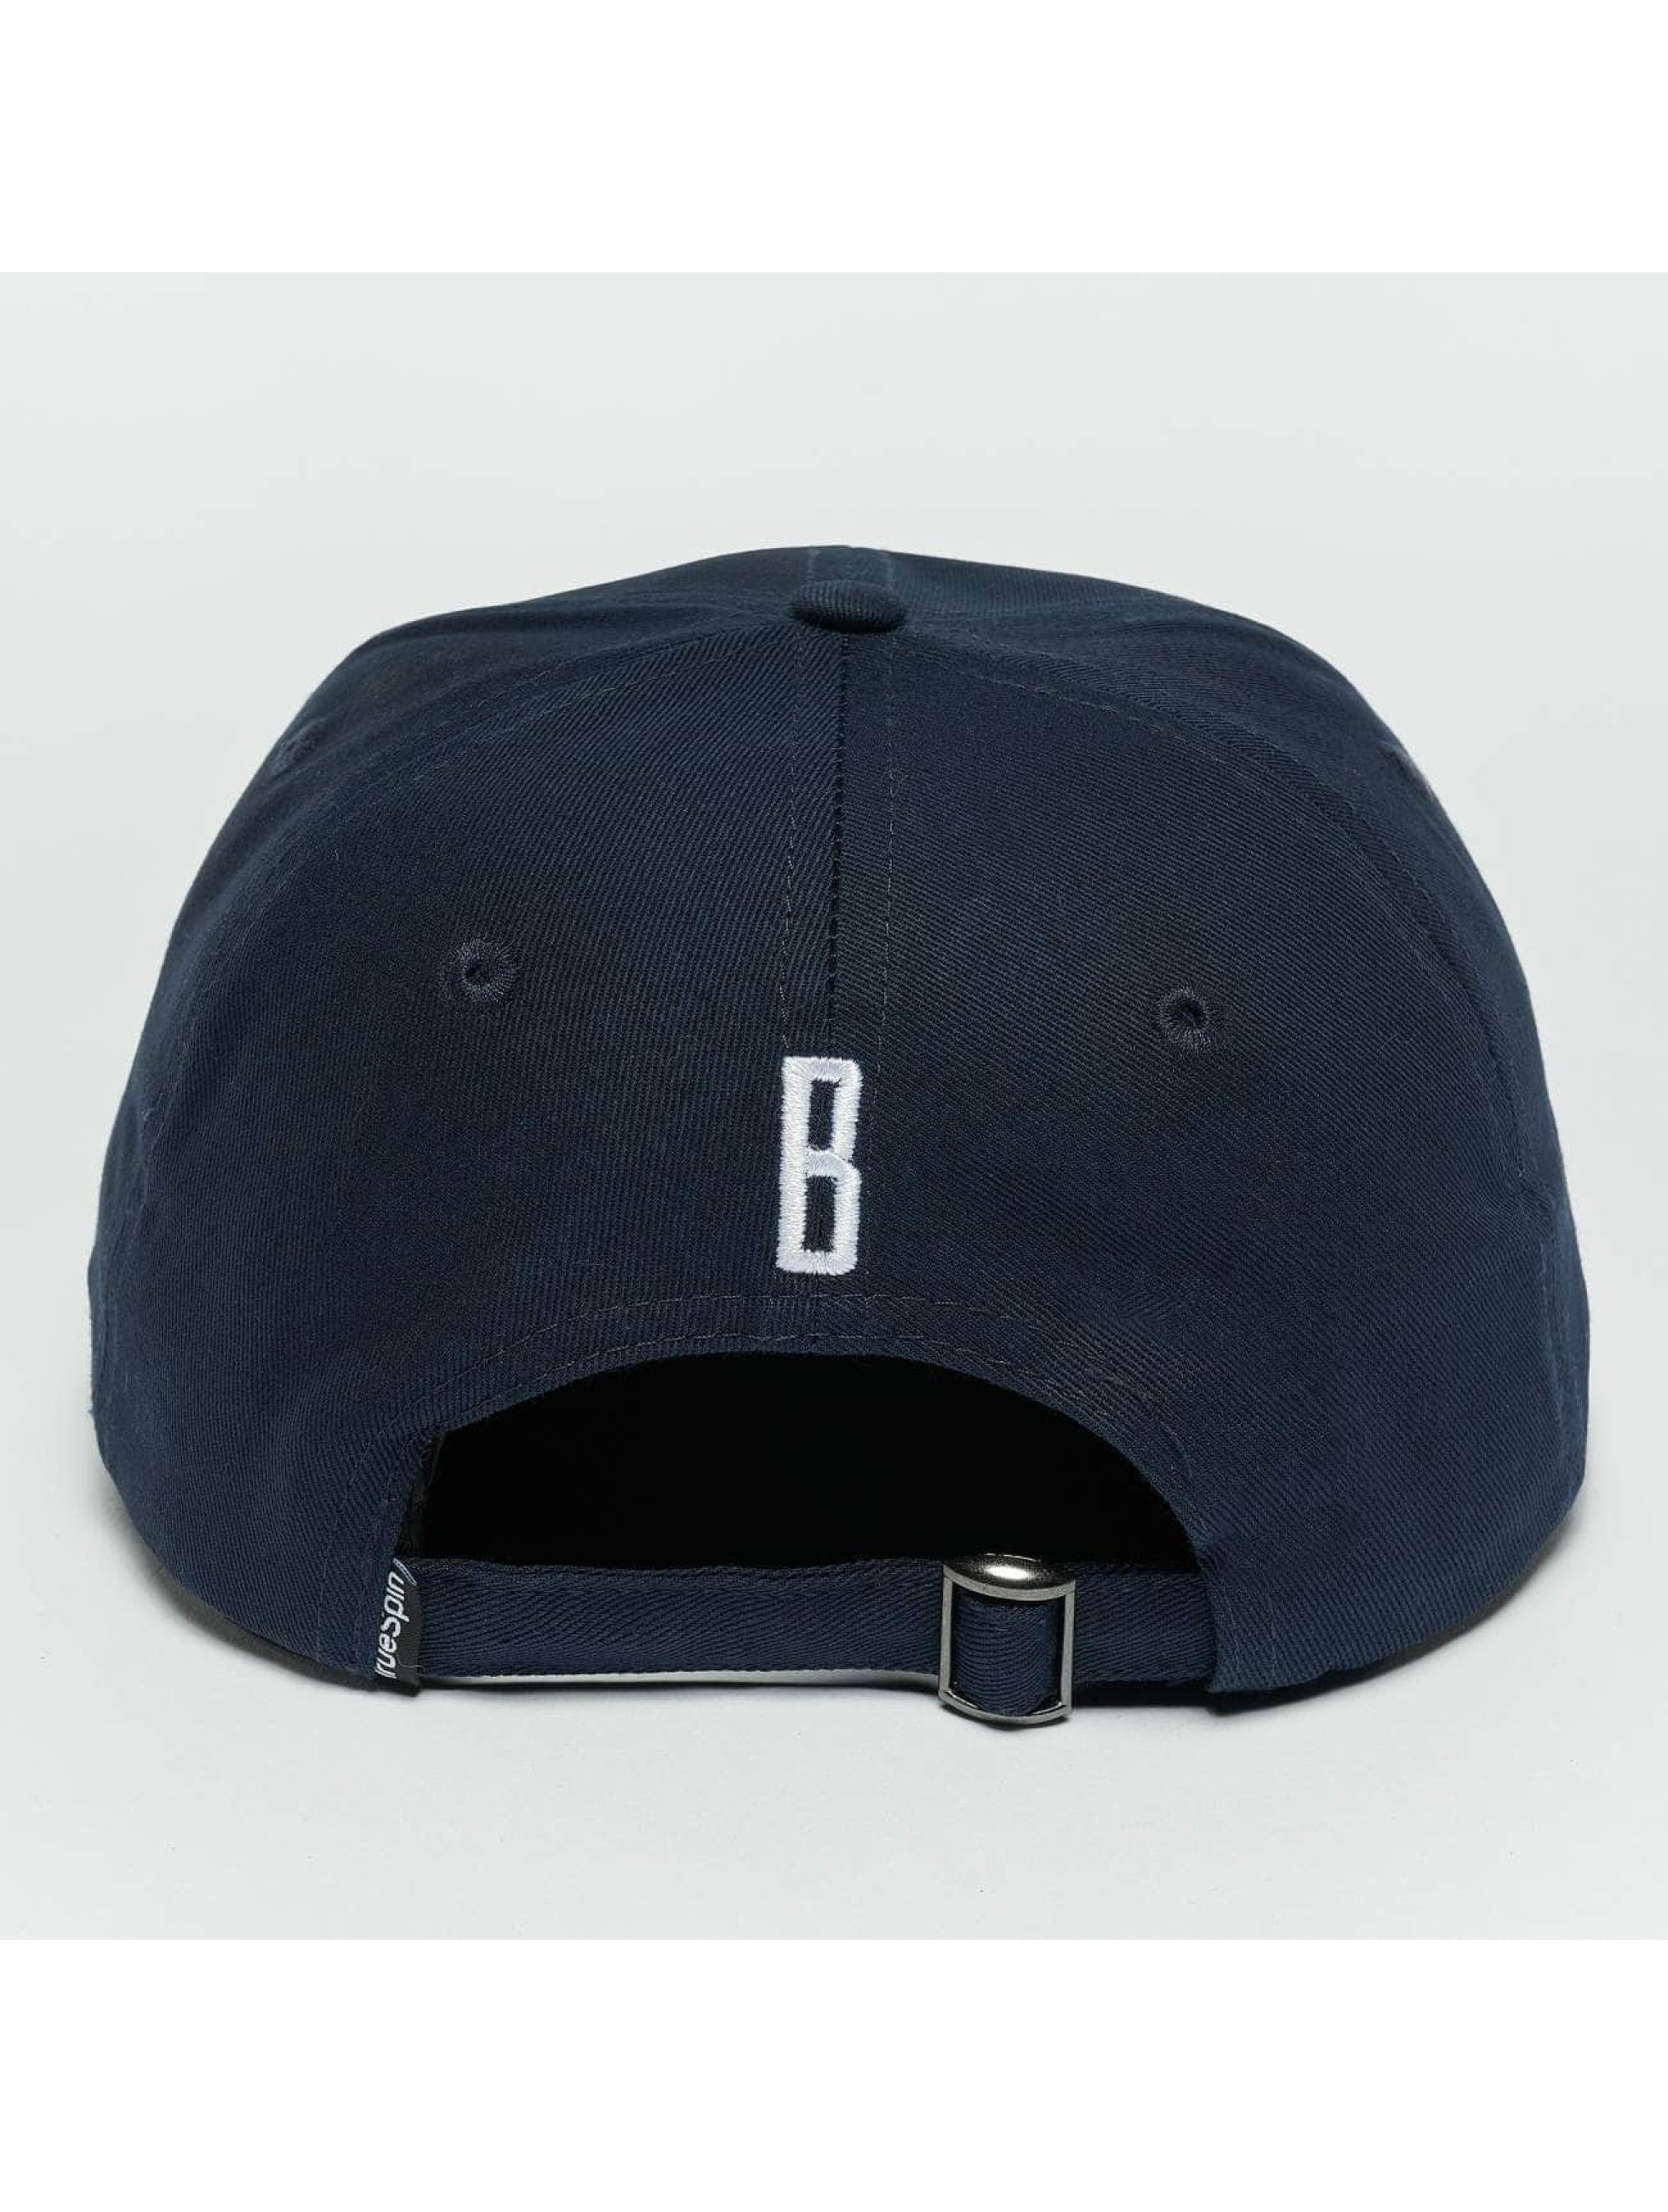 TrueSpin Casquette Snapback & Strapback ABC B bleu